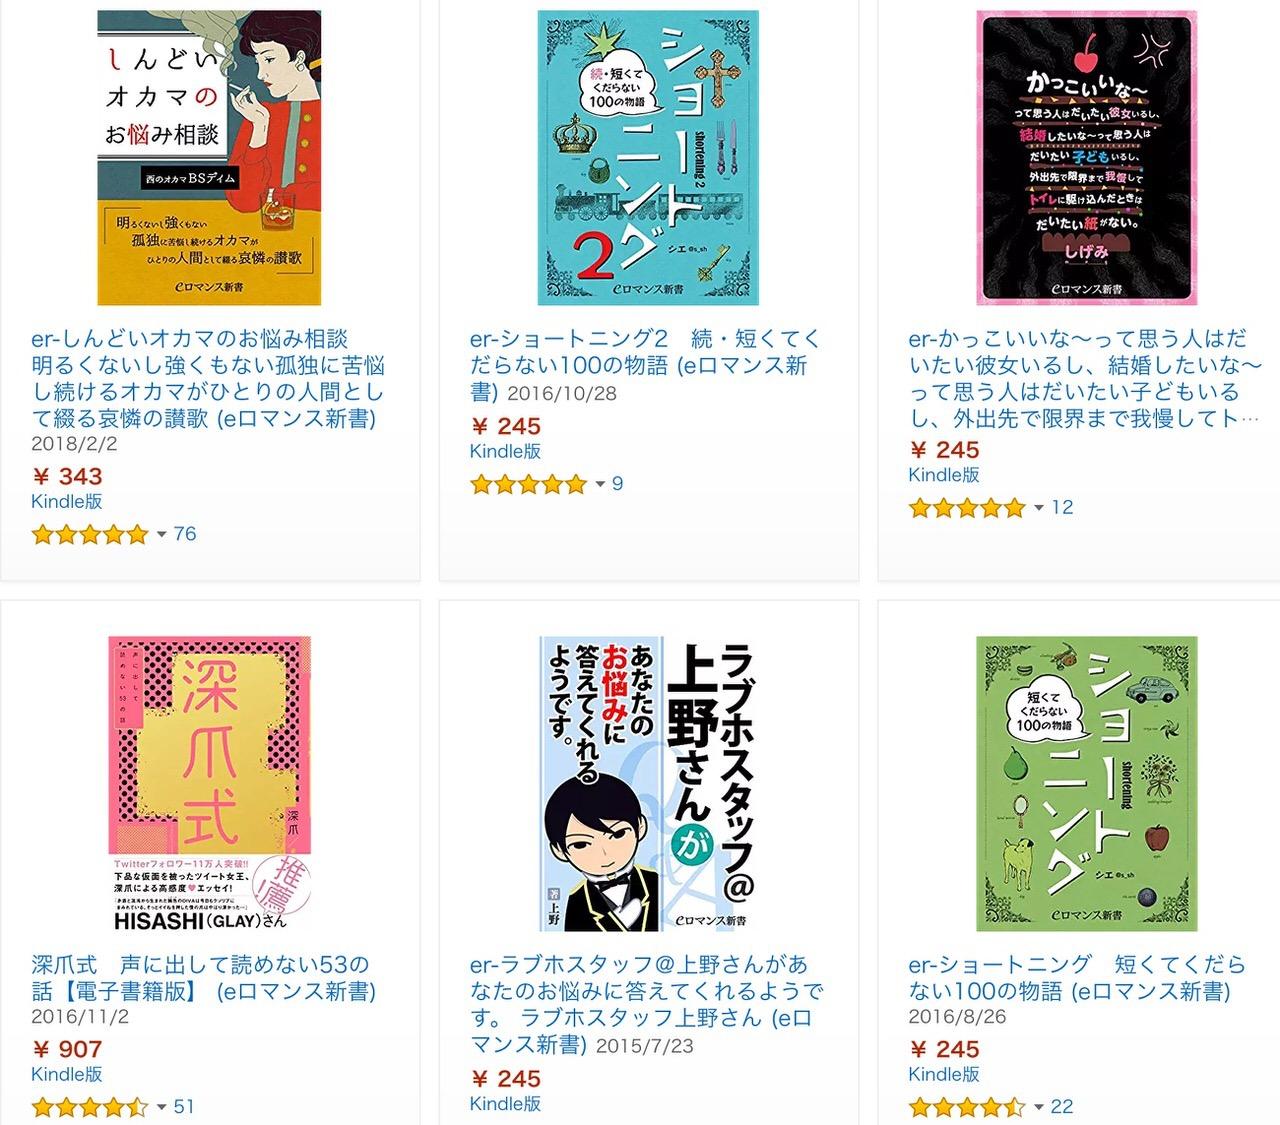 【Kindleセール】最大50%OFF「SNS発の人気著者作品フェア」(10/11まで)